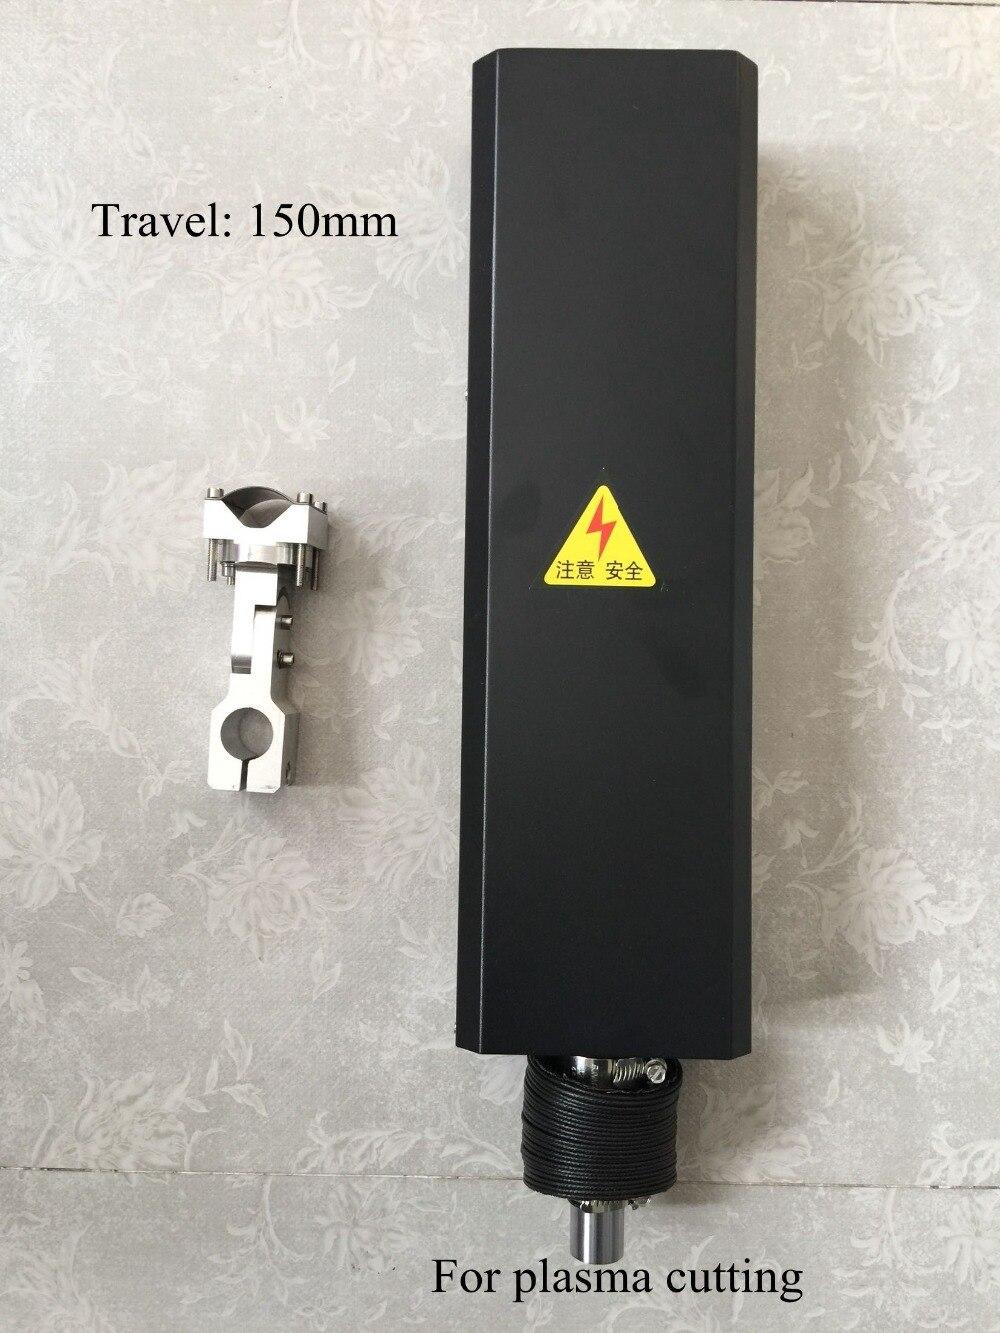 24VDC 150mm Travel 2150mm min CNC Plasma Cutting Lifter Z axis Standard Clamp